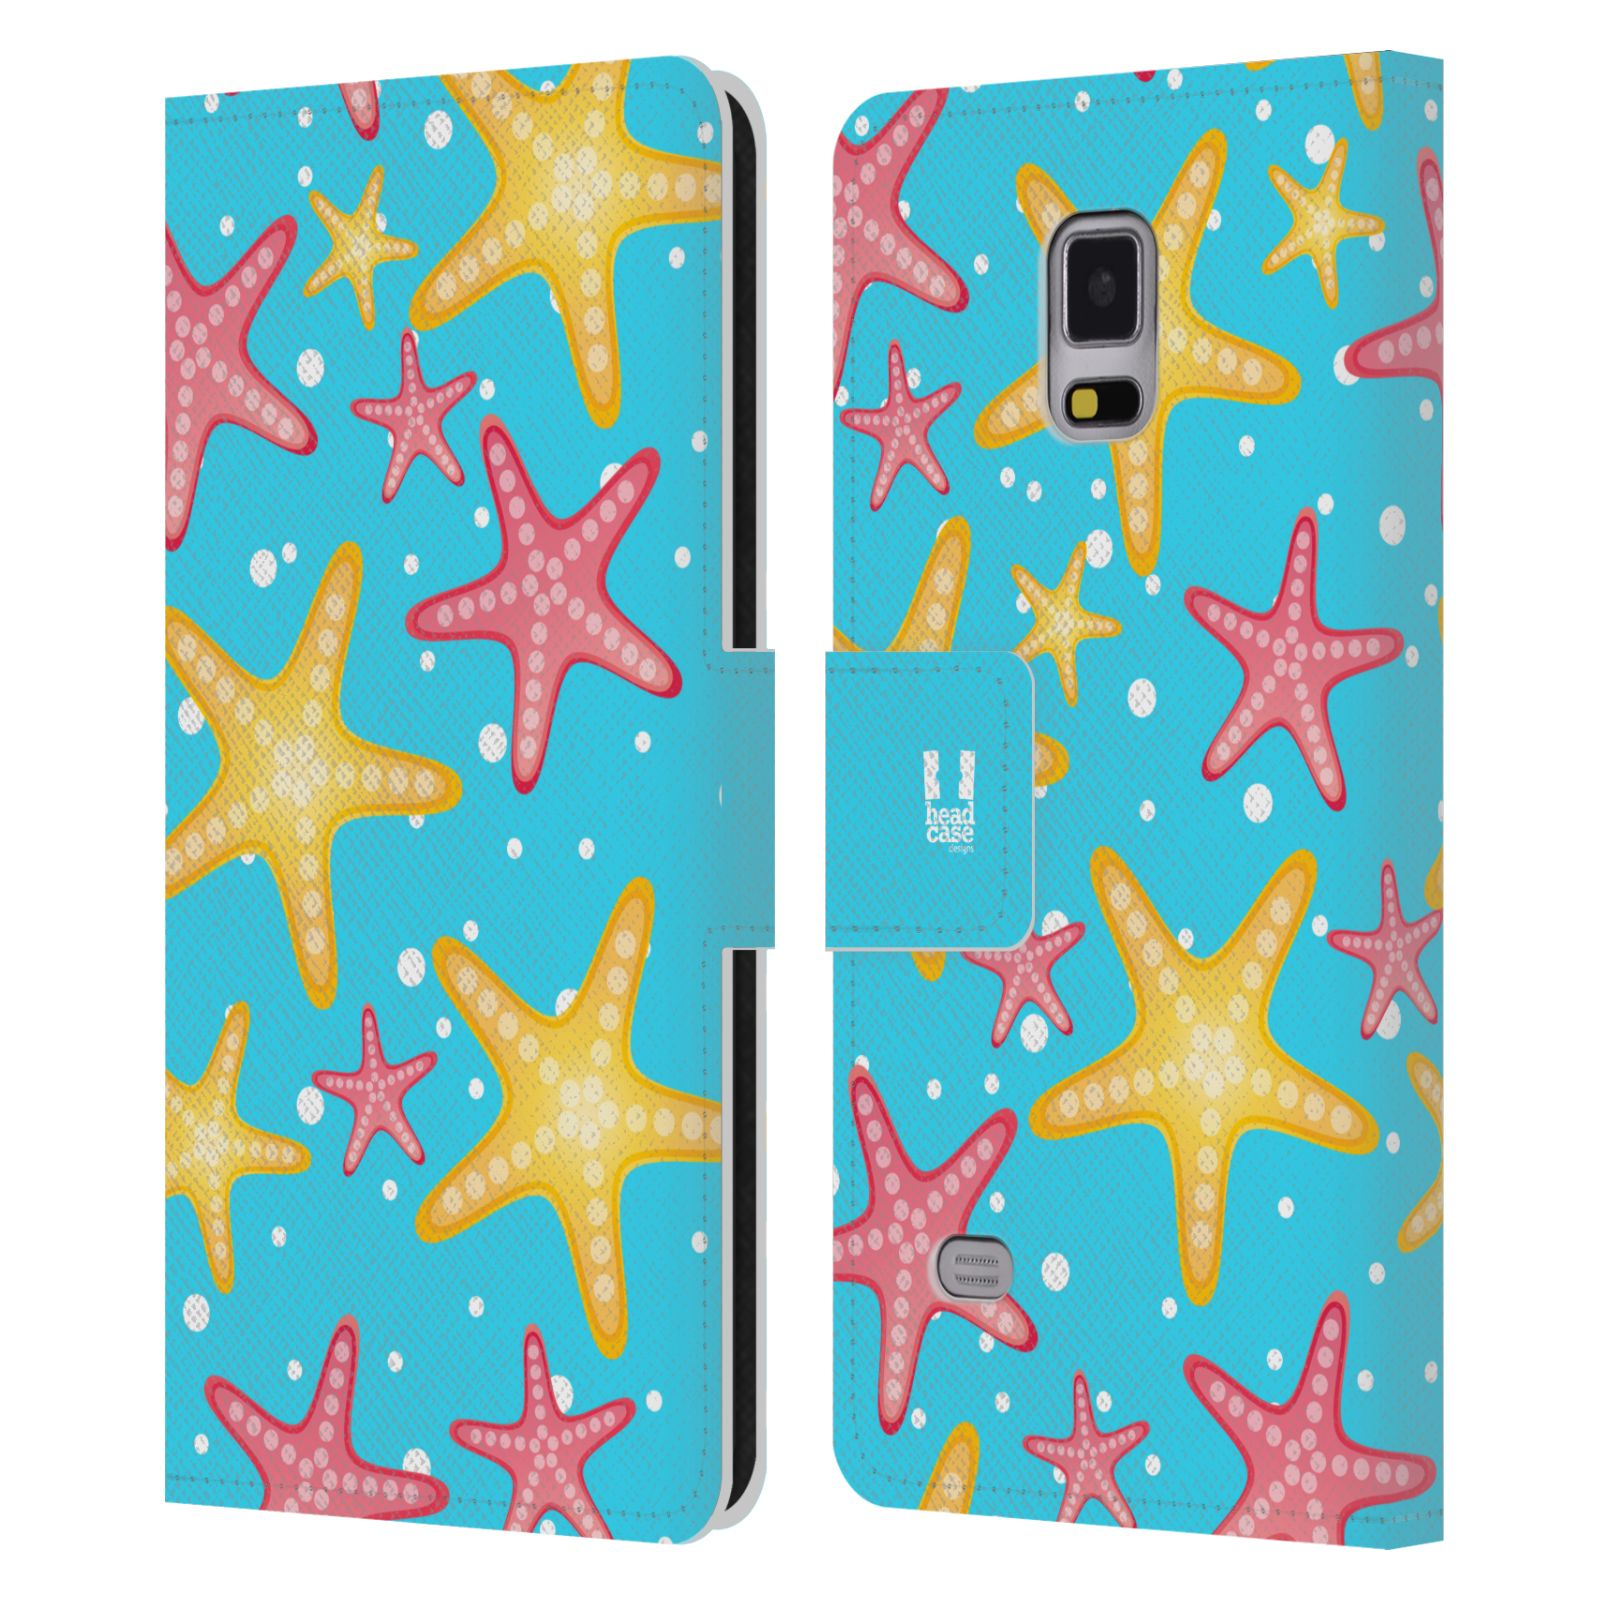 HEAD CASE Flipové pouzdro pro mobil Samsung Galaxy Note 4 Mořský živočich hvězdice modrá barva pozadí